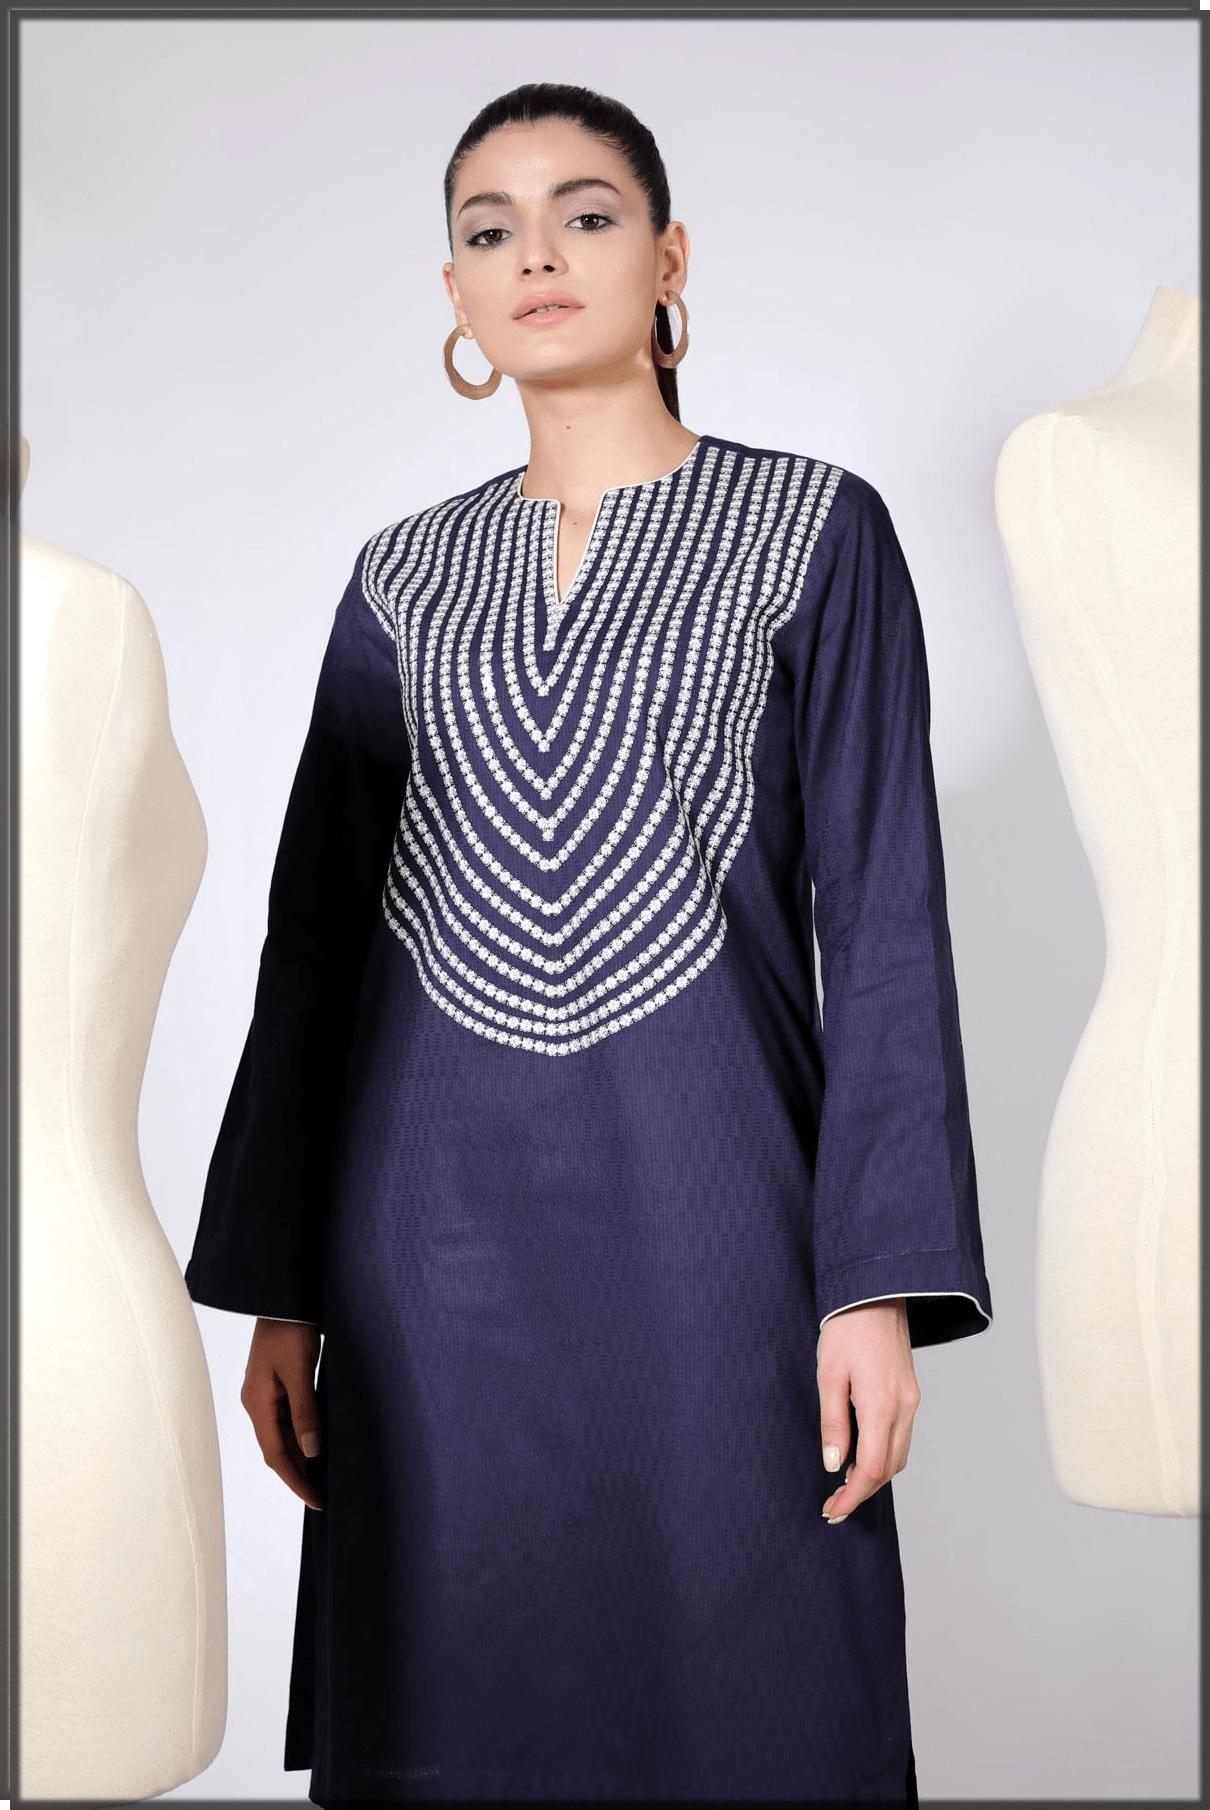 latest kurta designs for women 2020